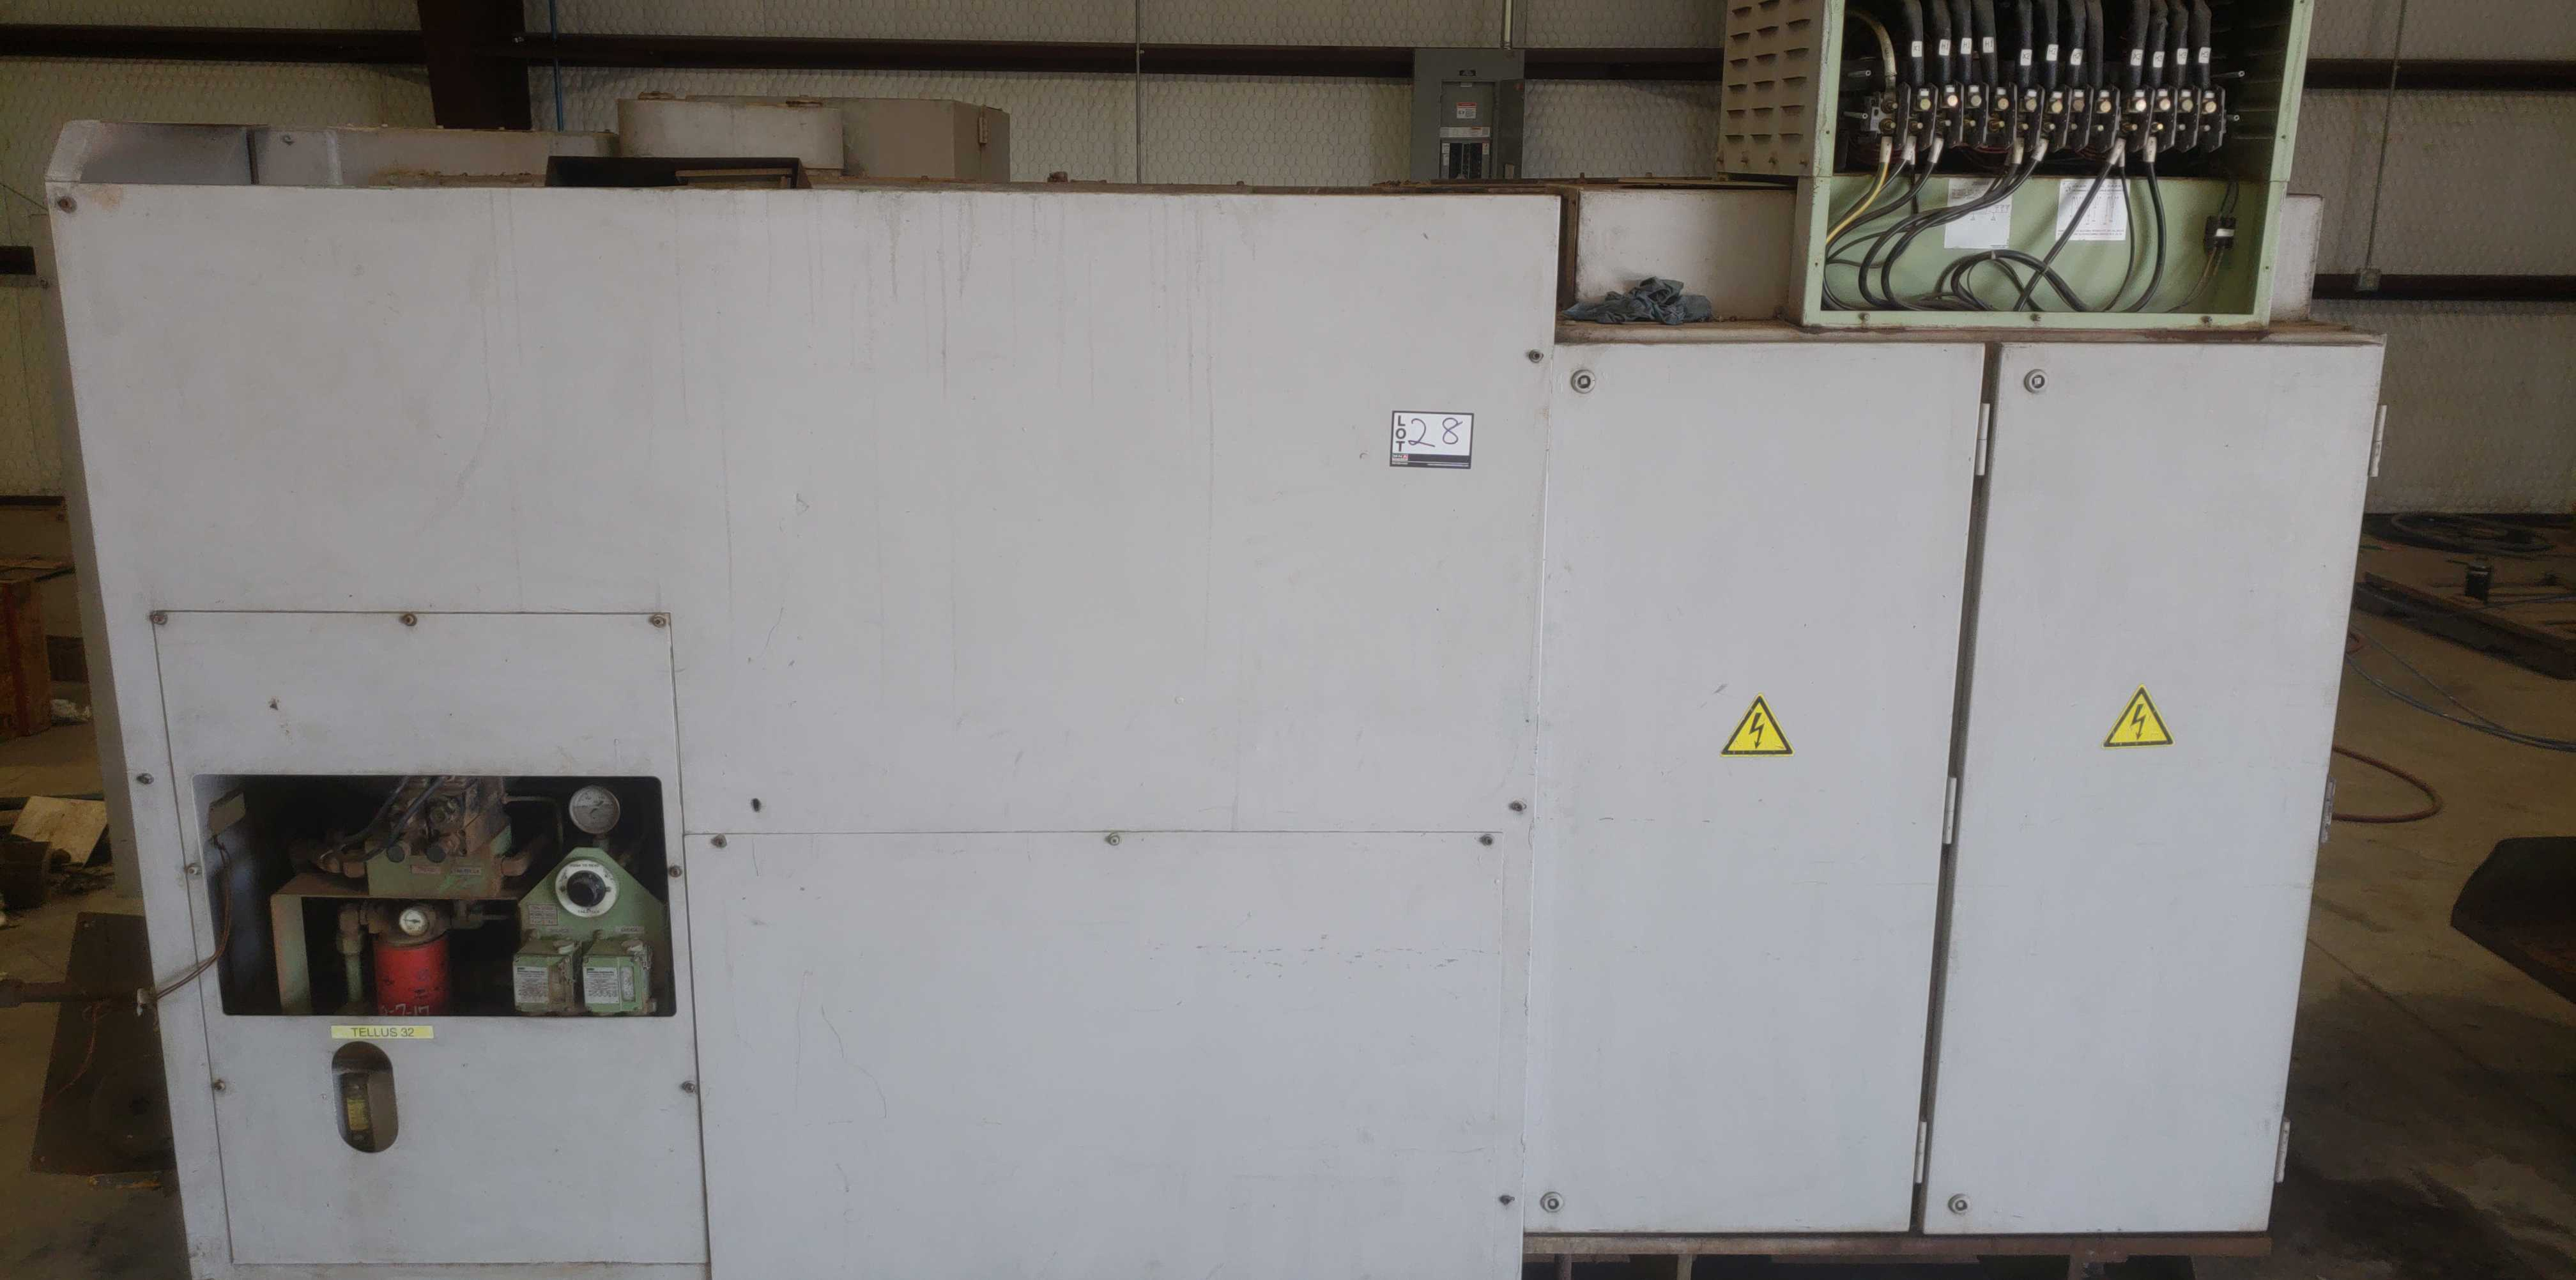 "Okuma LB 25 2 Axis CNC lathe, 5020 control, chip conveyor, 10"" chuck SN: 07049681 - Image 2 of 4"